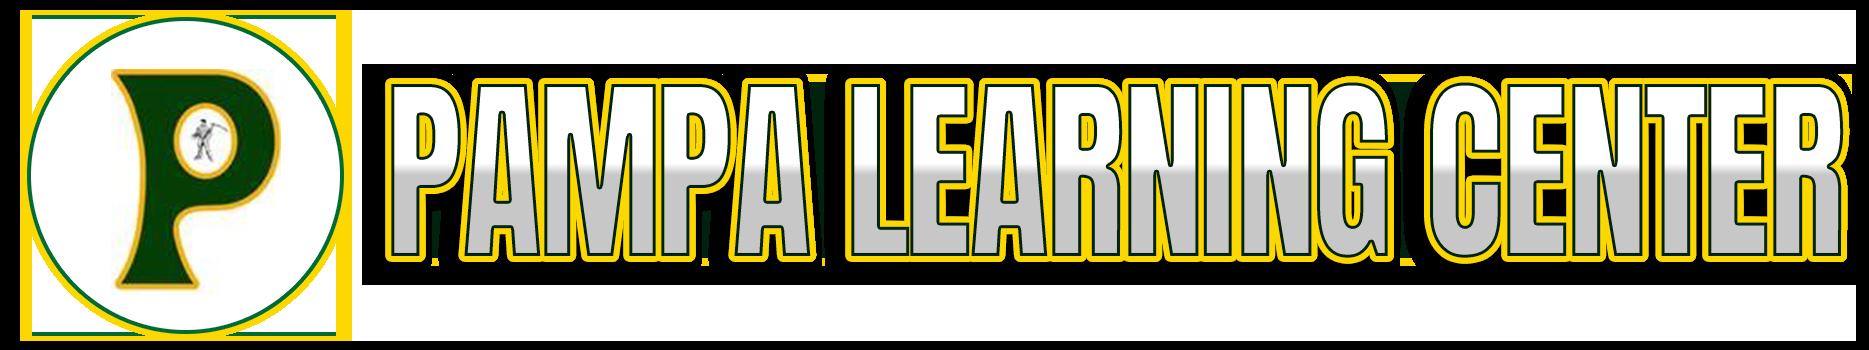 Pampa Learning CenterLogo